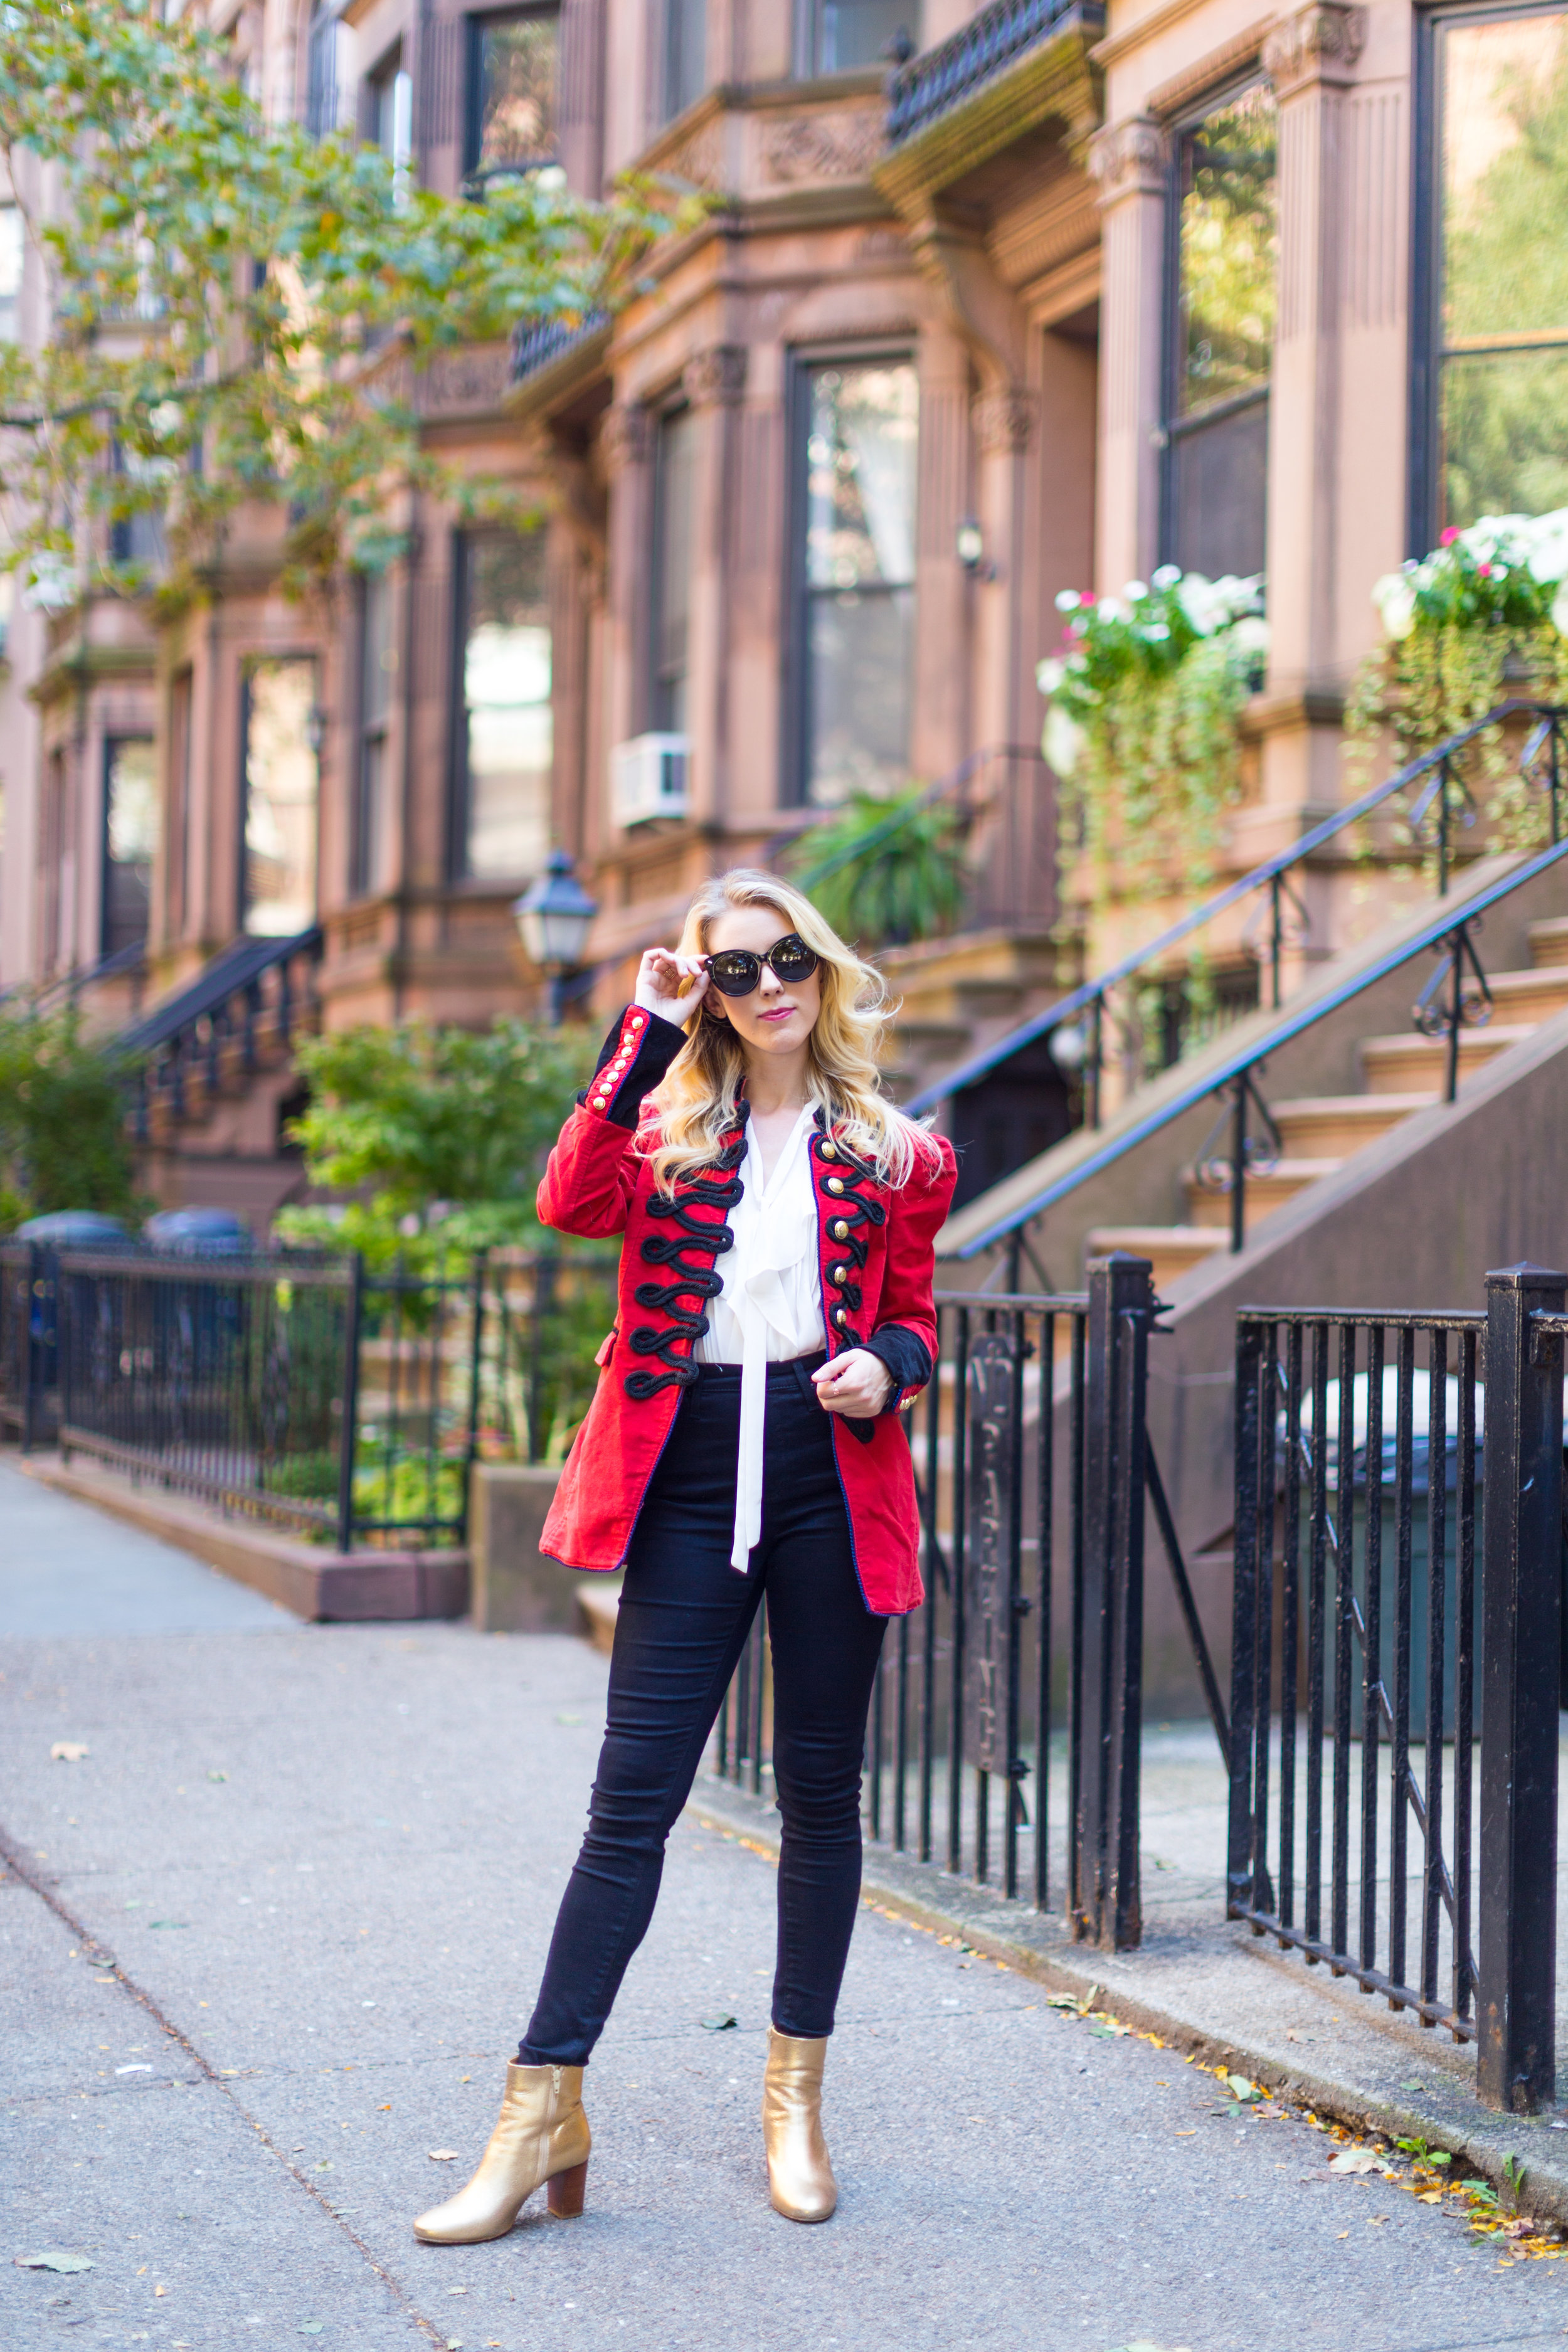 Fall Fashion Red Band Jacket Trendy-7.jpg